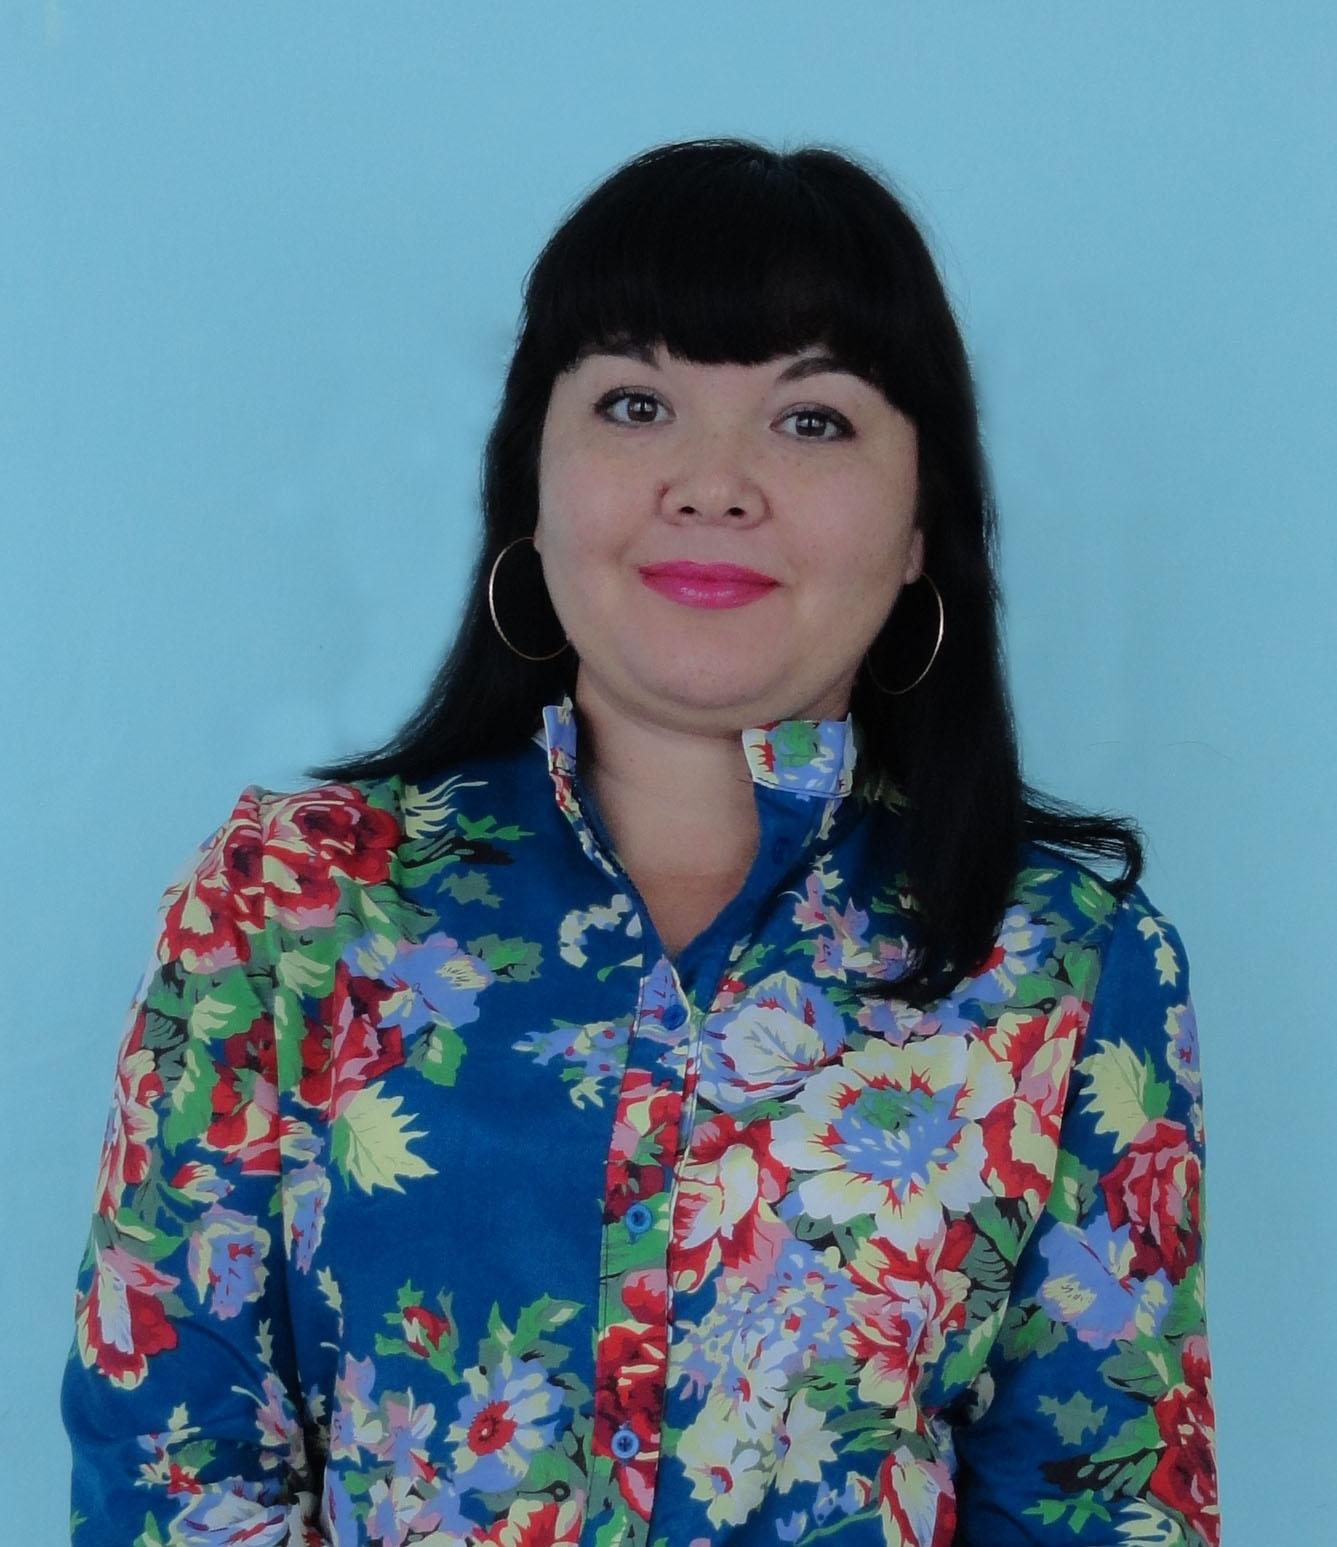 Черепченко Лола Анатольевна